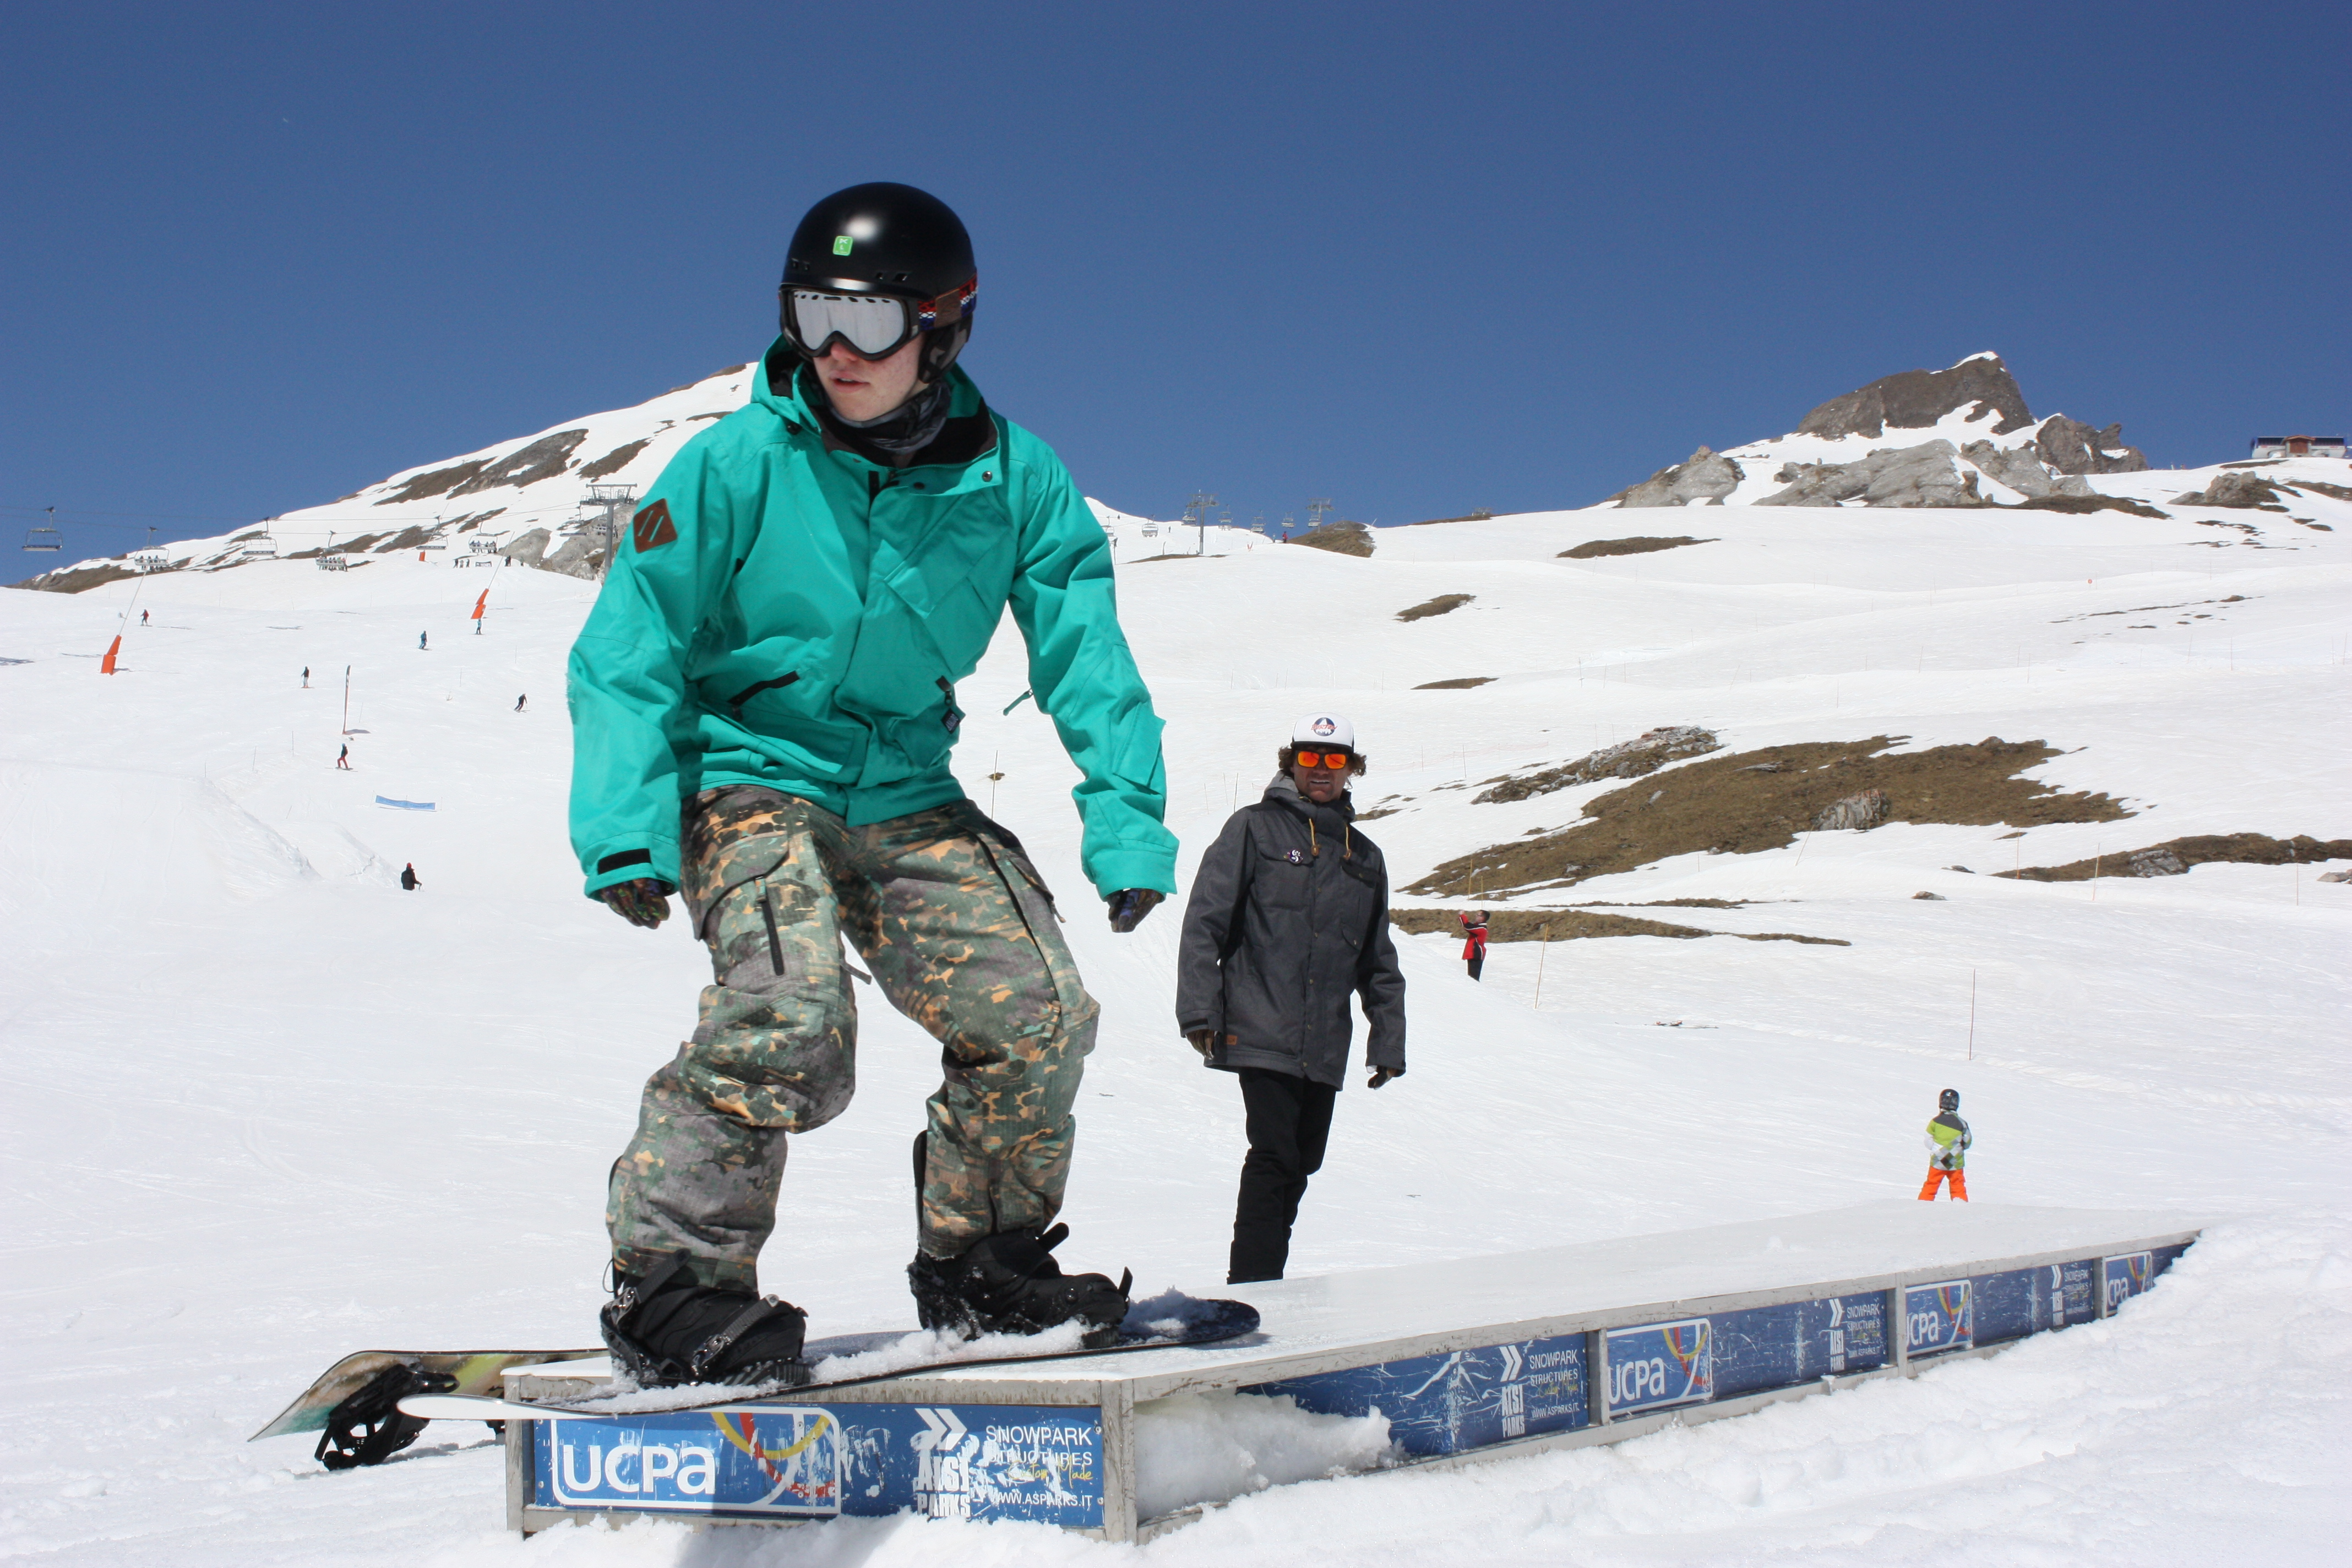 snowboard,schools,tignes,snowboard, lessons, off-piste, snowboarding,